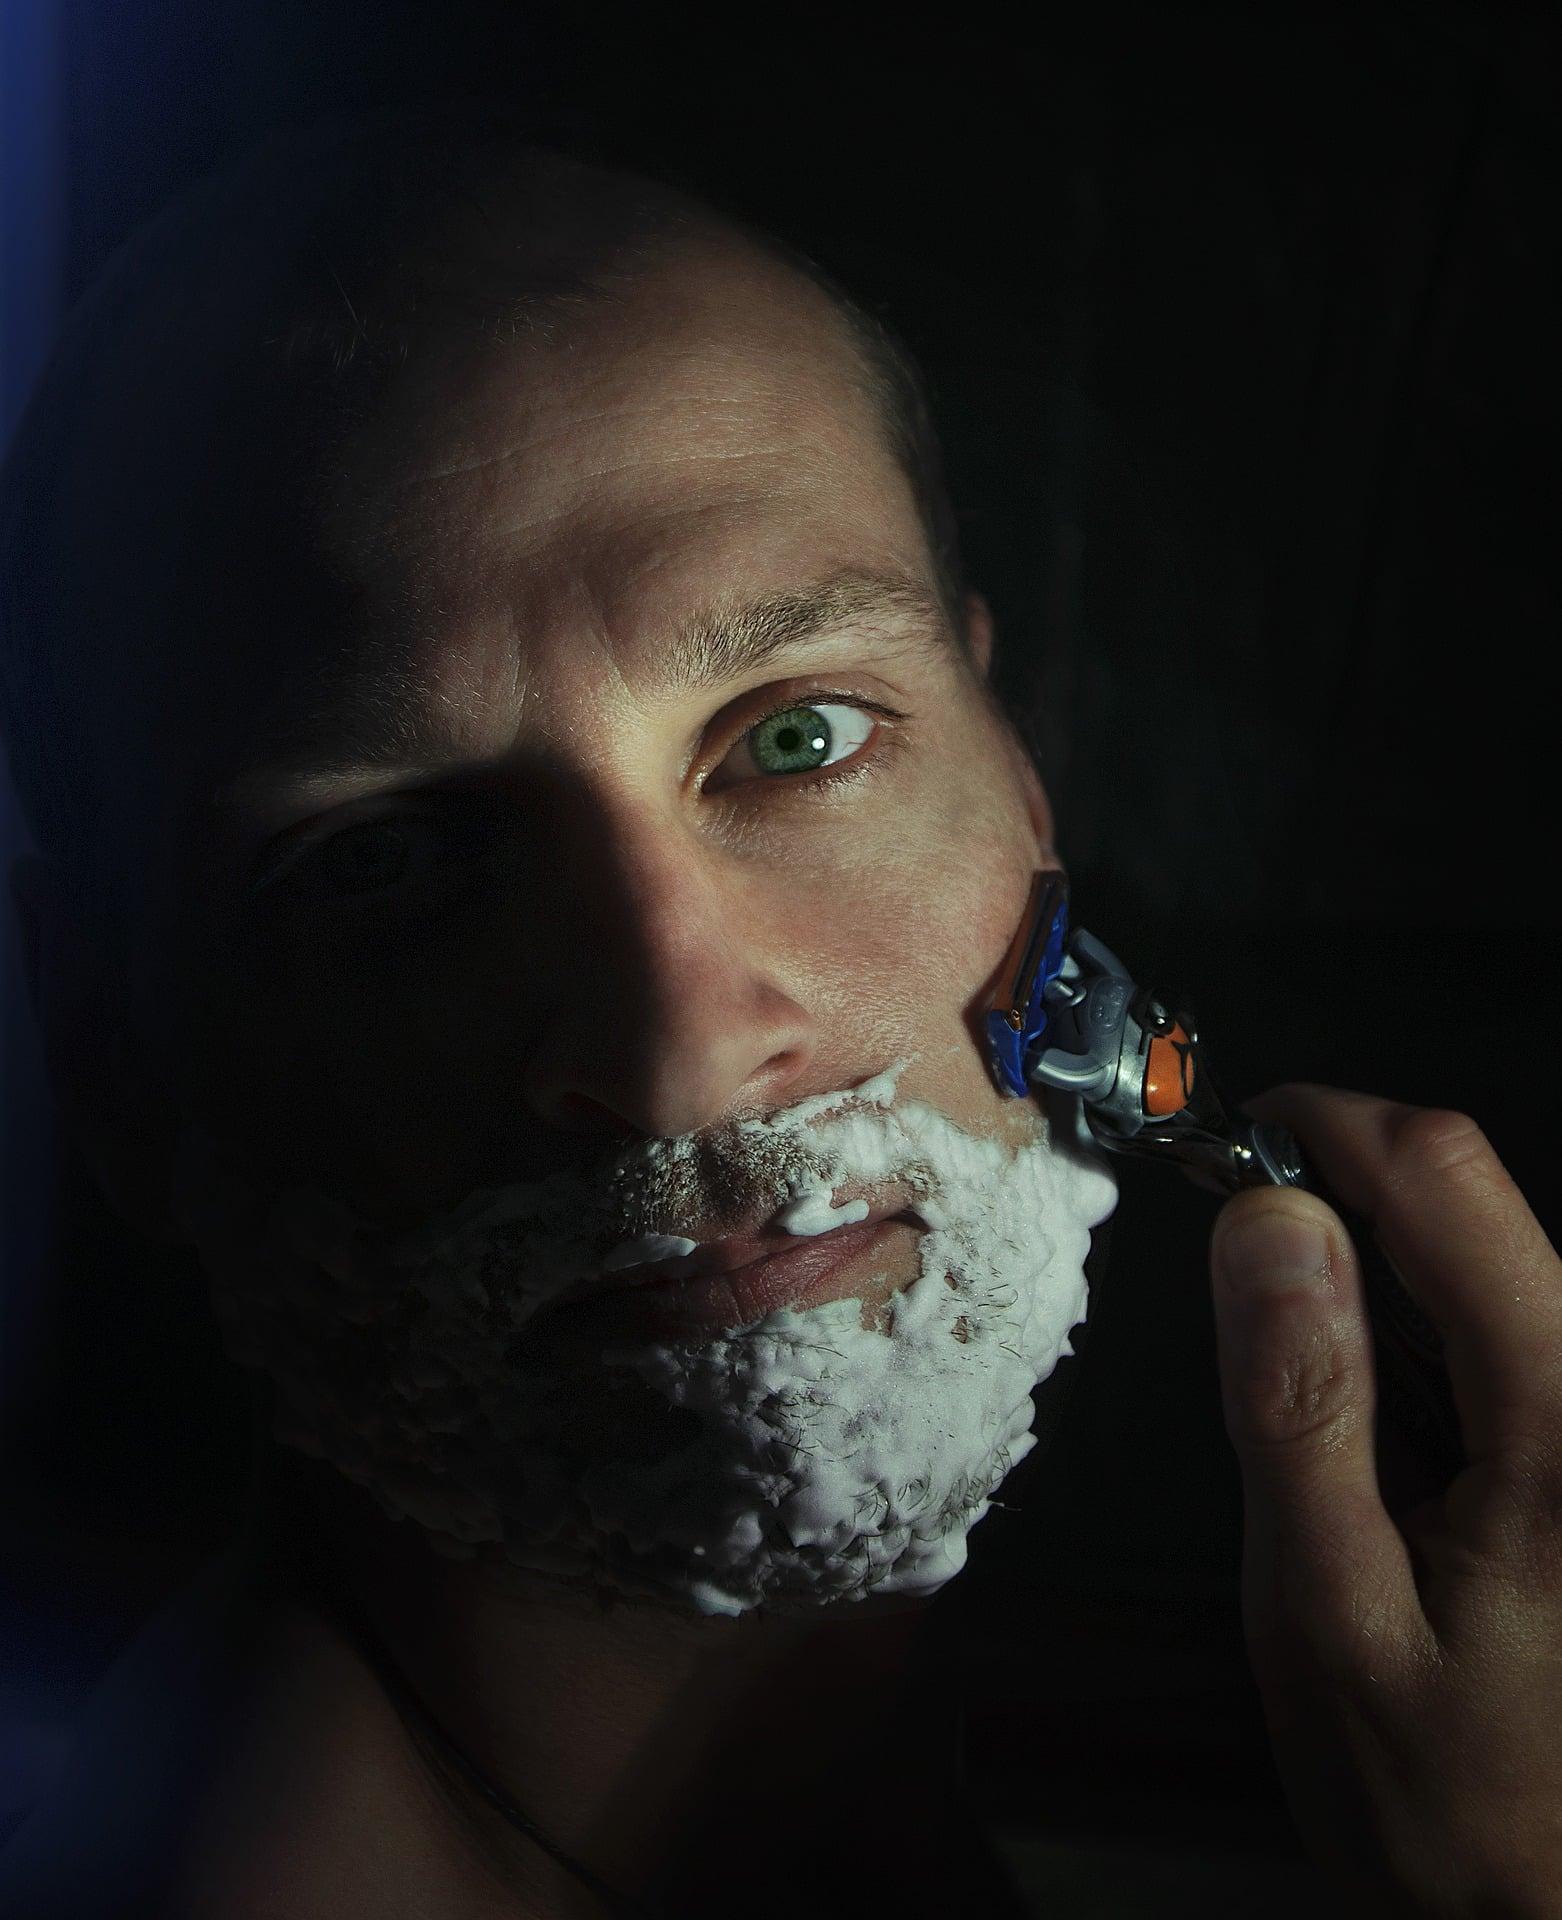 Frau erobern - Mann rasieren